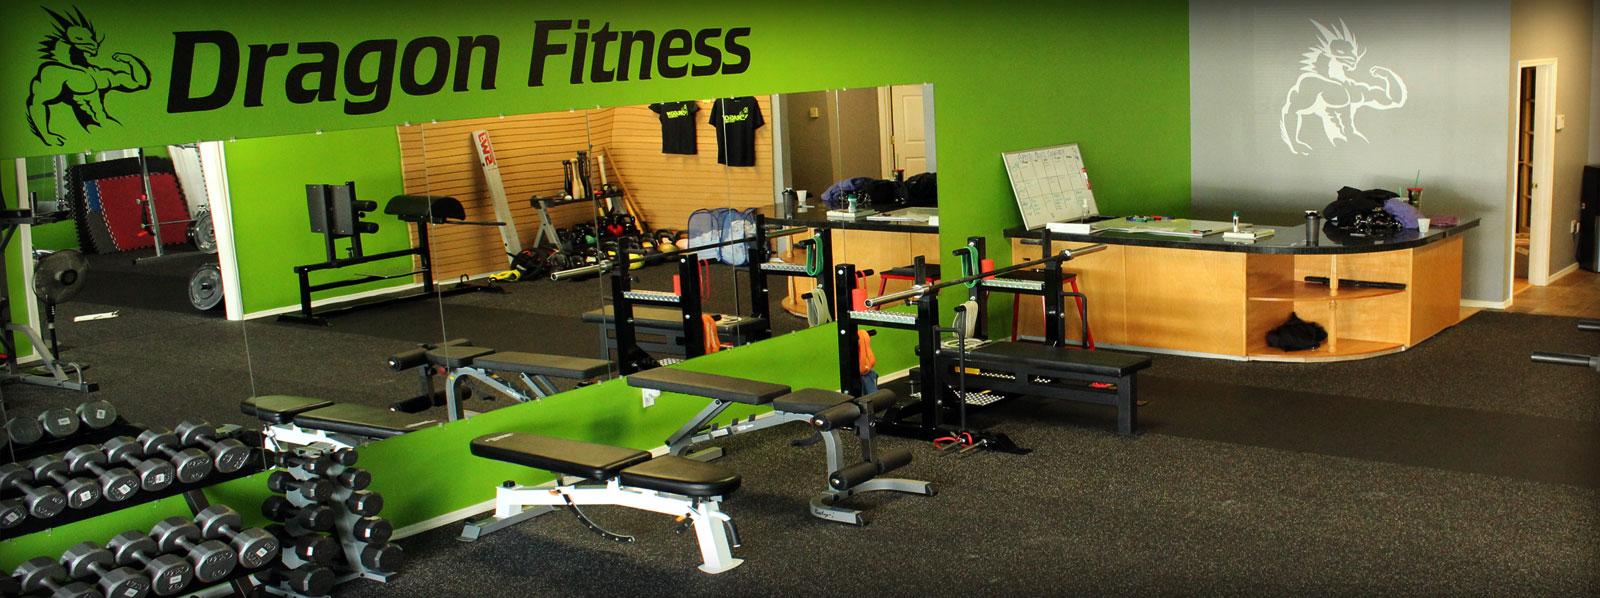 personal training studio vancouver, wa